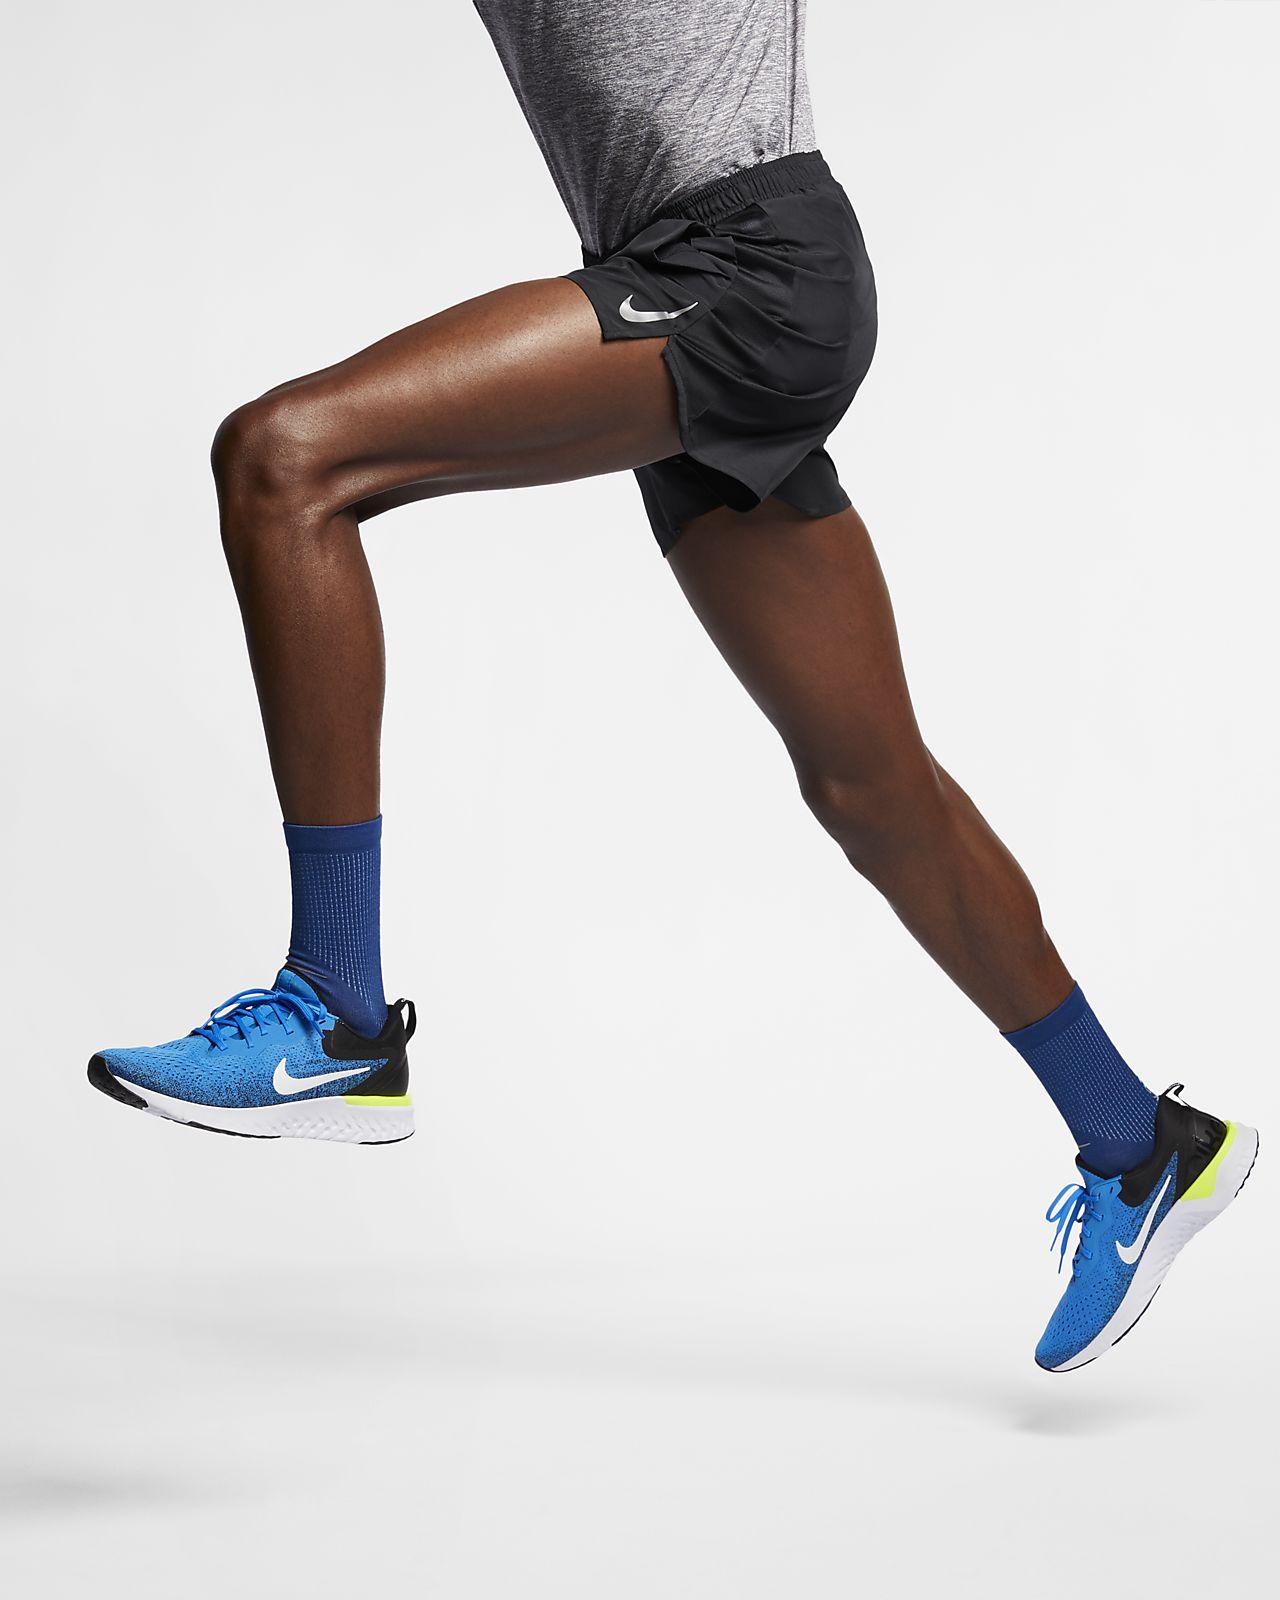 153d4241d5ff Low Resolution Nike Challenger Men s Running Shorts Nike Challenger Men s  Running Shorts